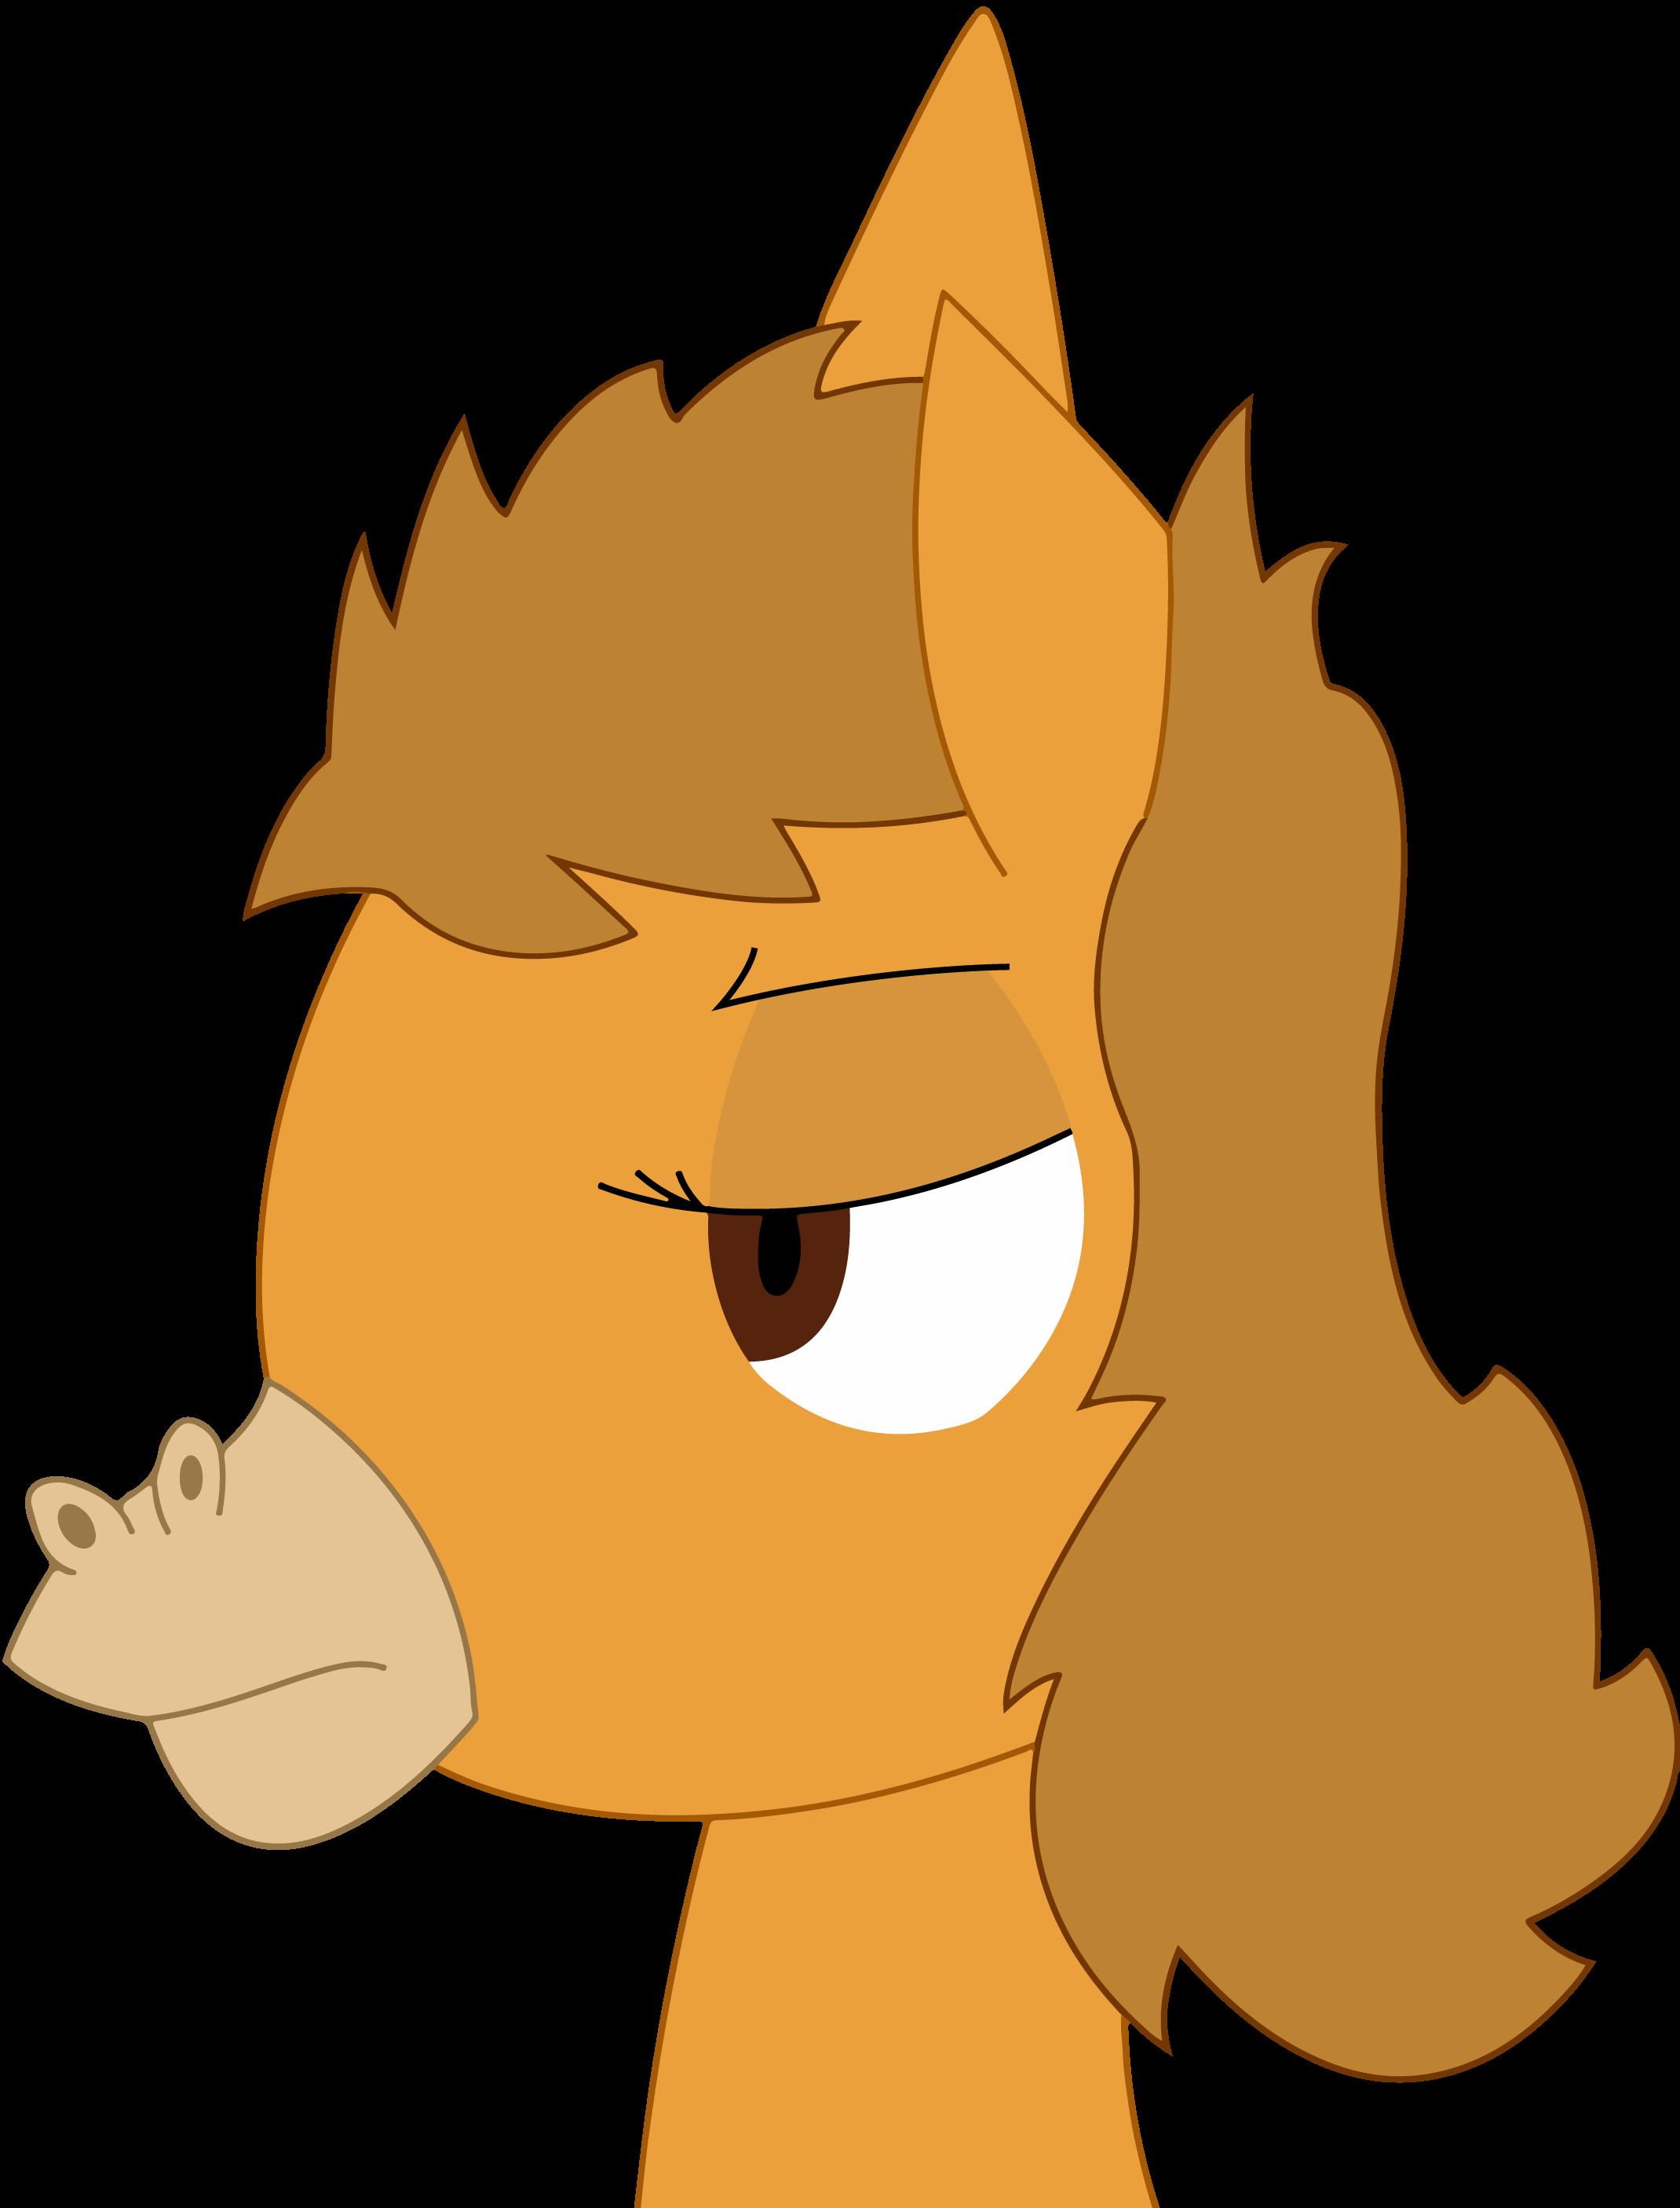 image Caramel cutie makes that dick explode